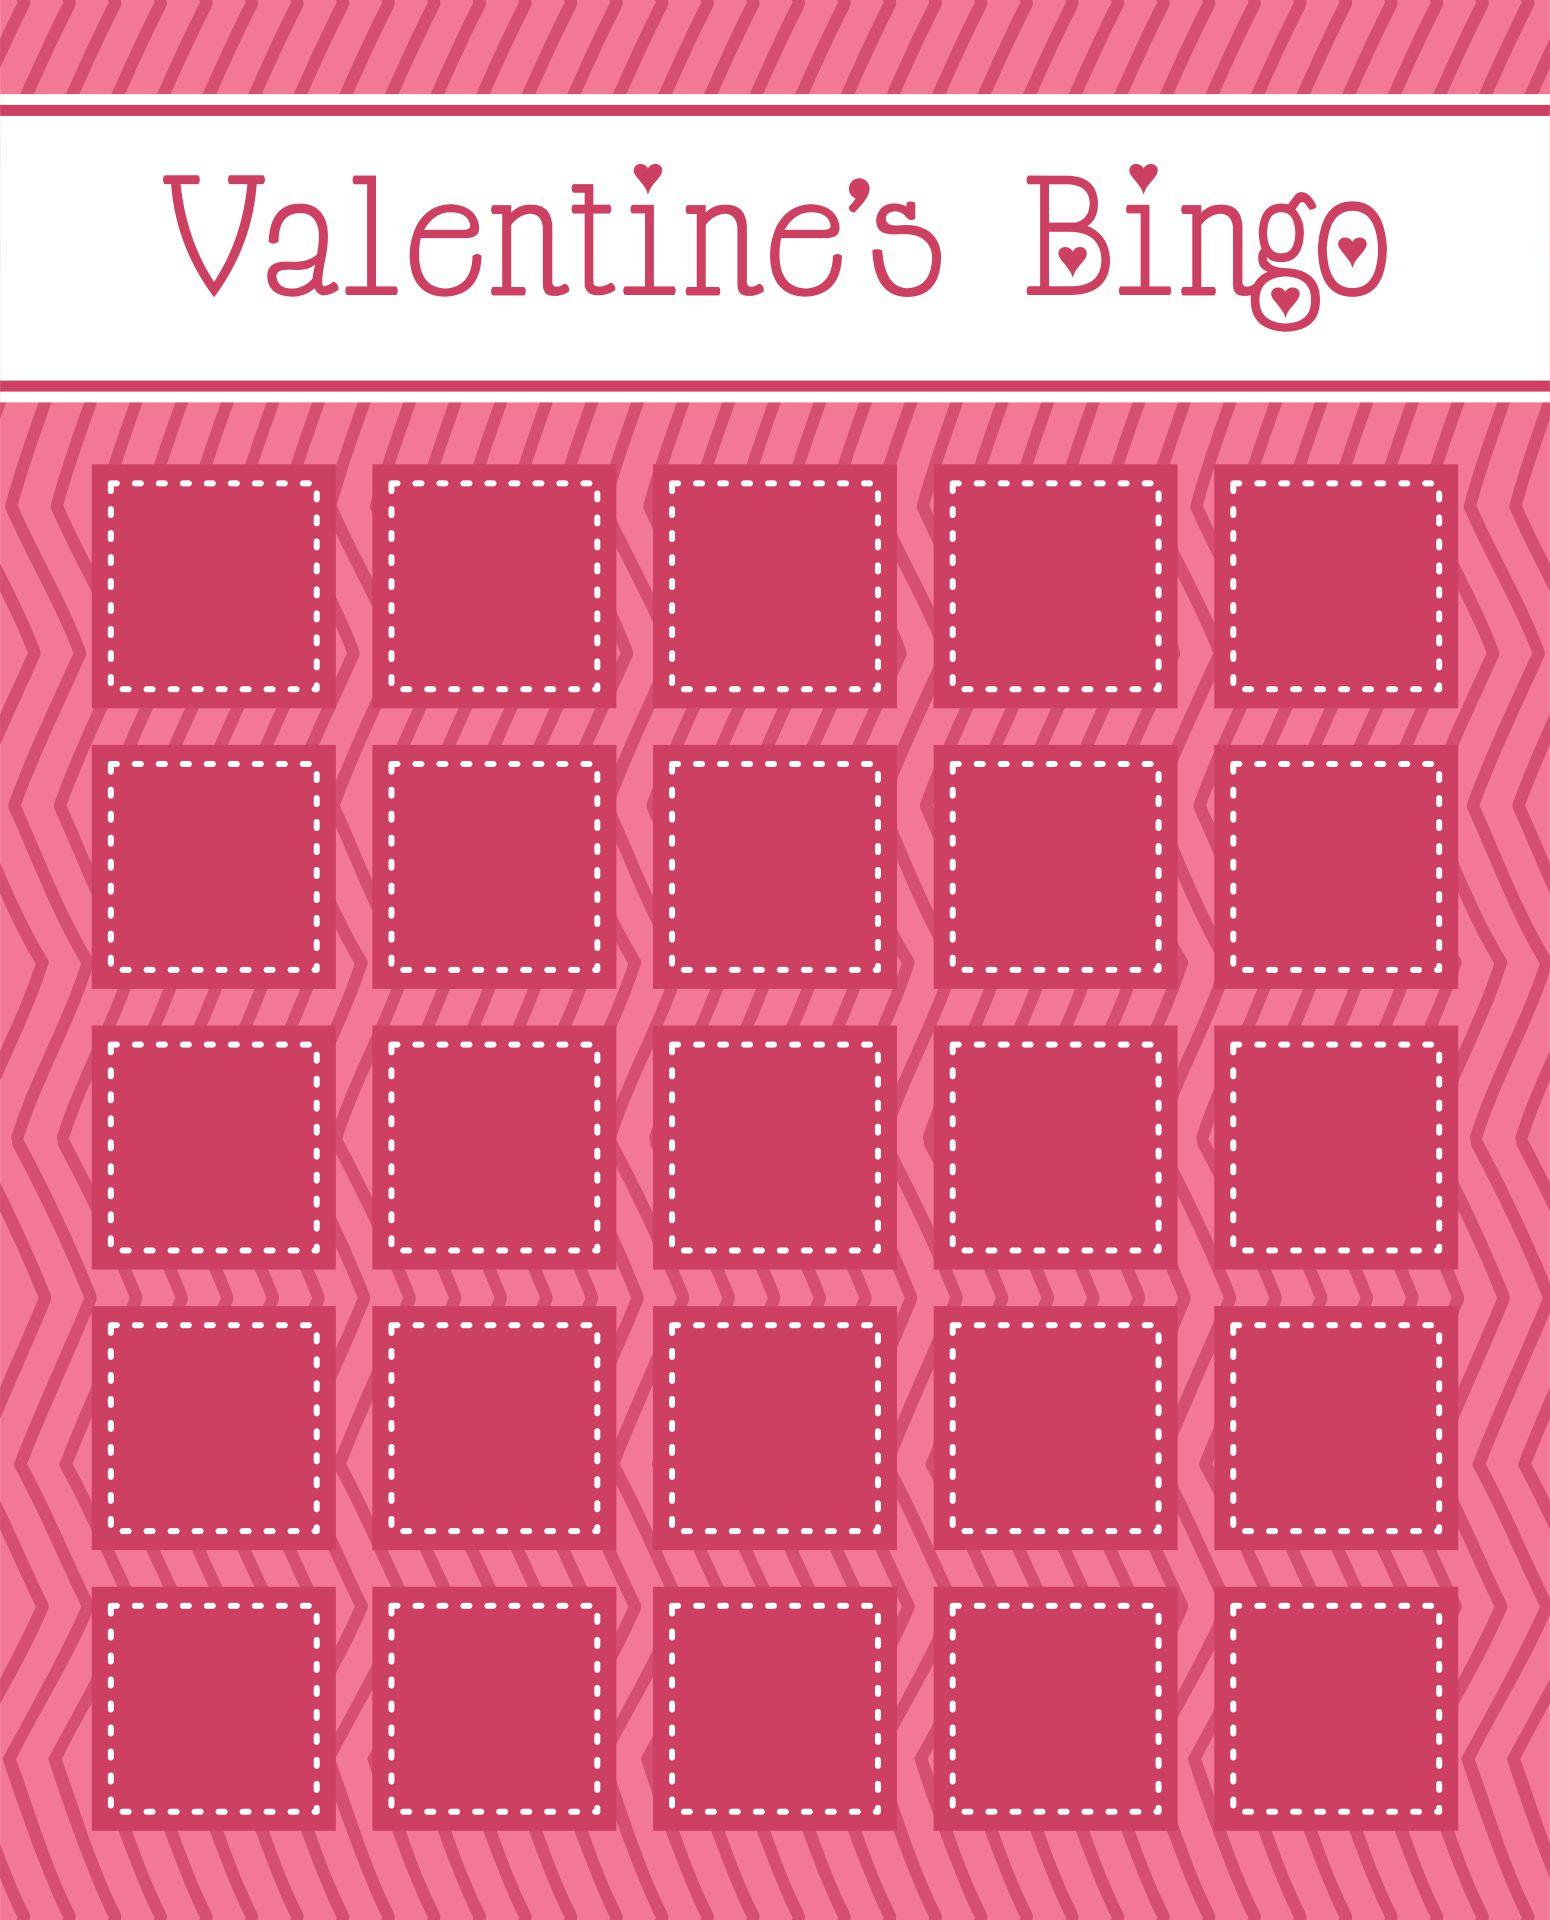 Valentine Bingo Game Pictures to Pin PinsDaddy – Free Printable Valentines Day Bingo Cards